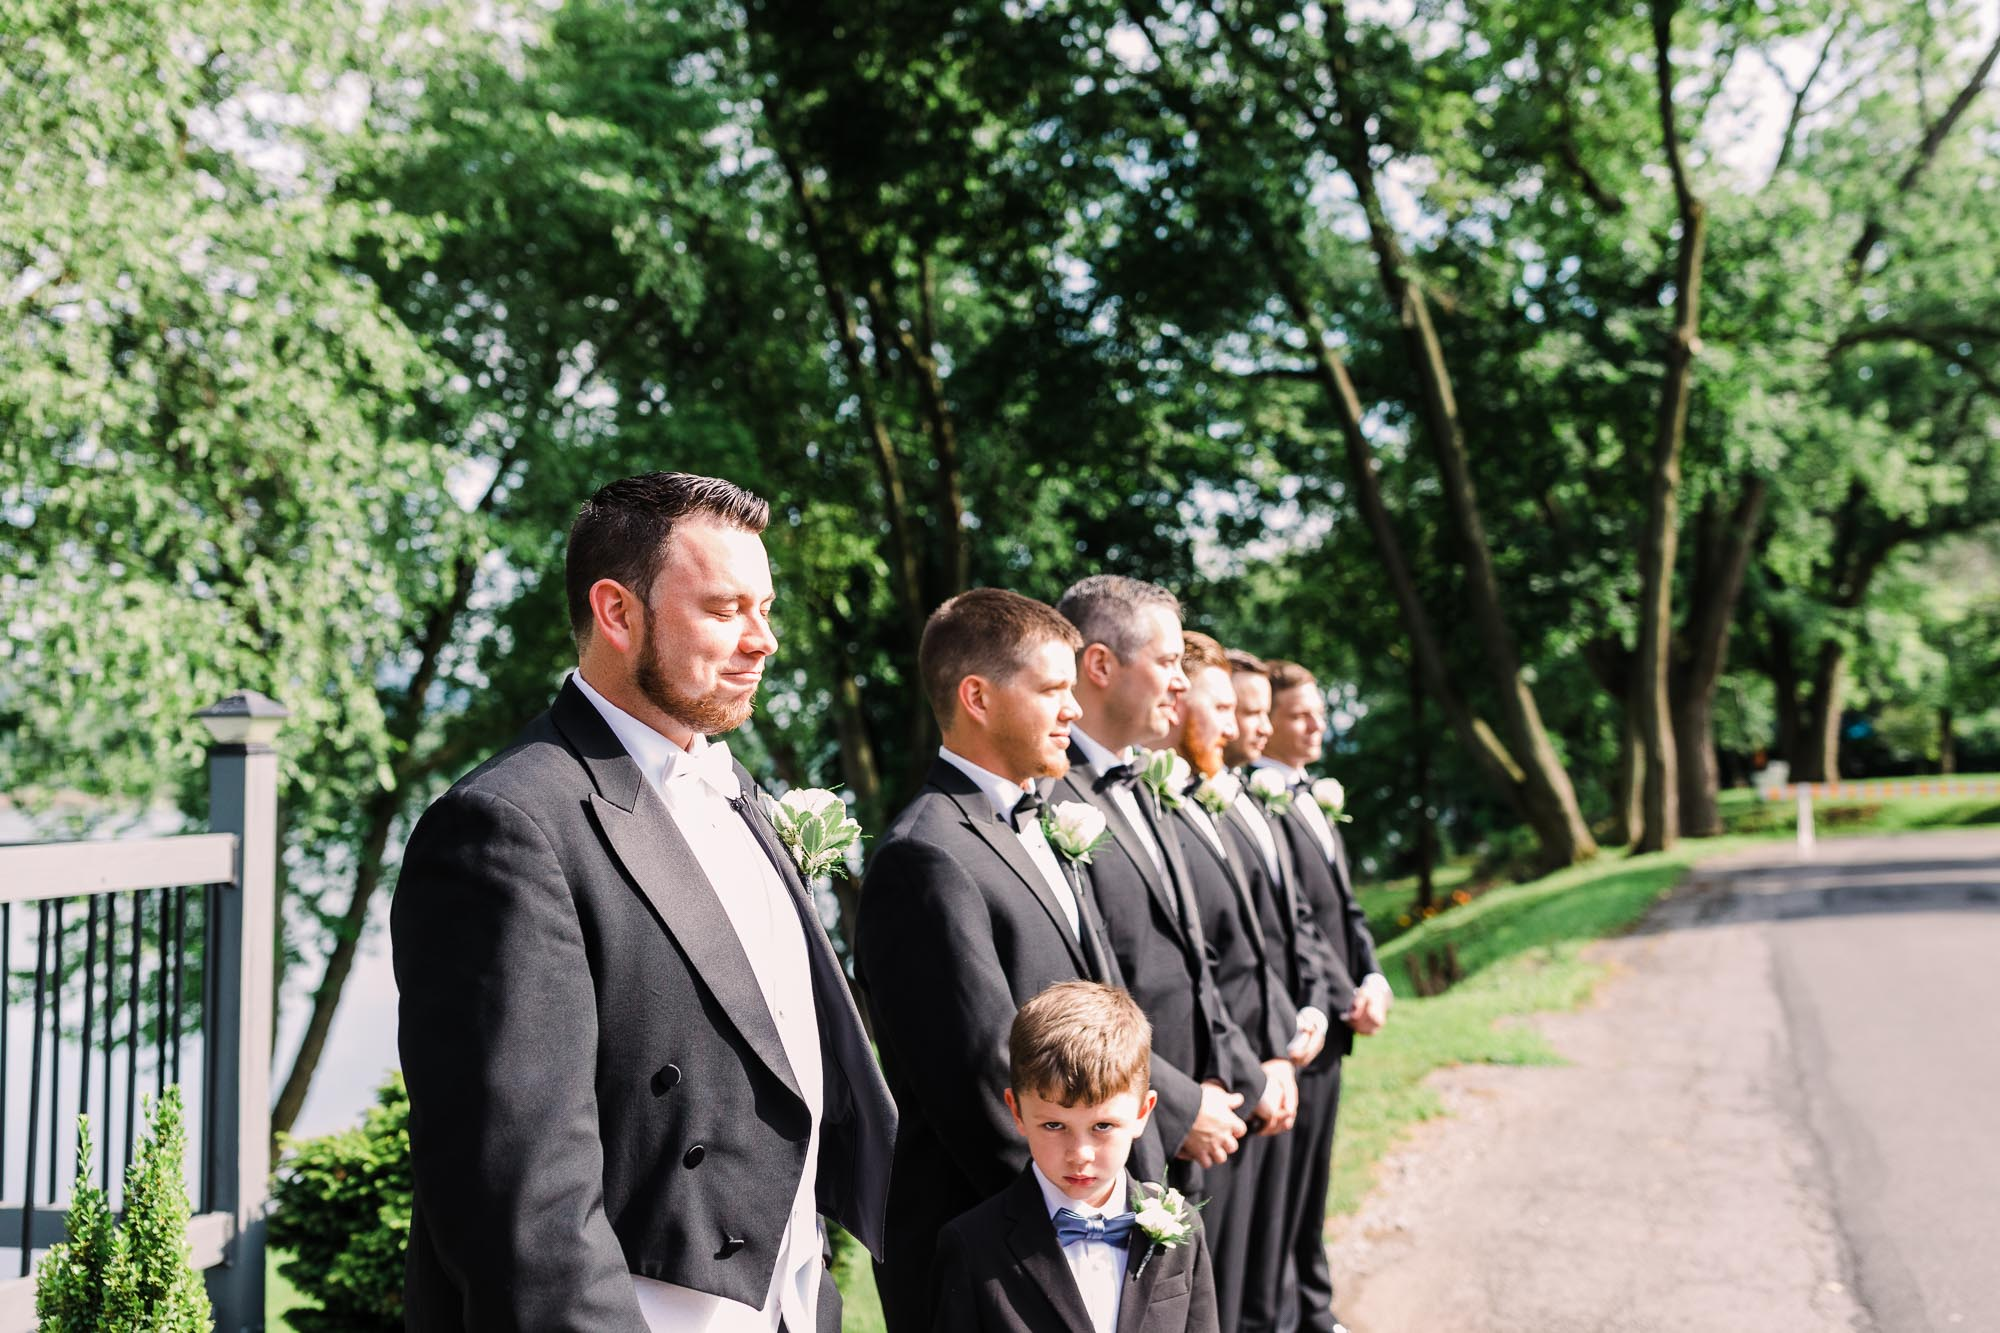 isle-of-que-wedding-6703.jpg